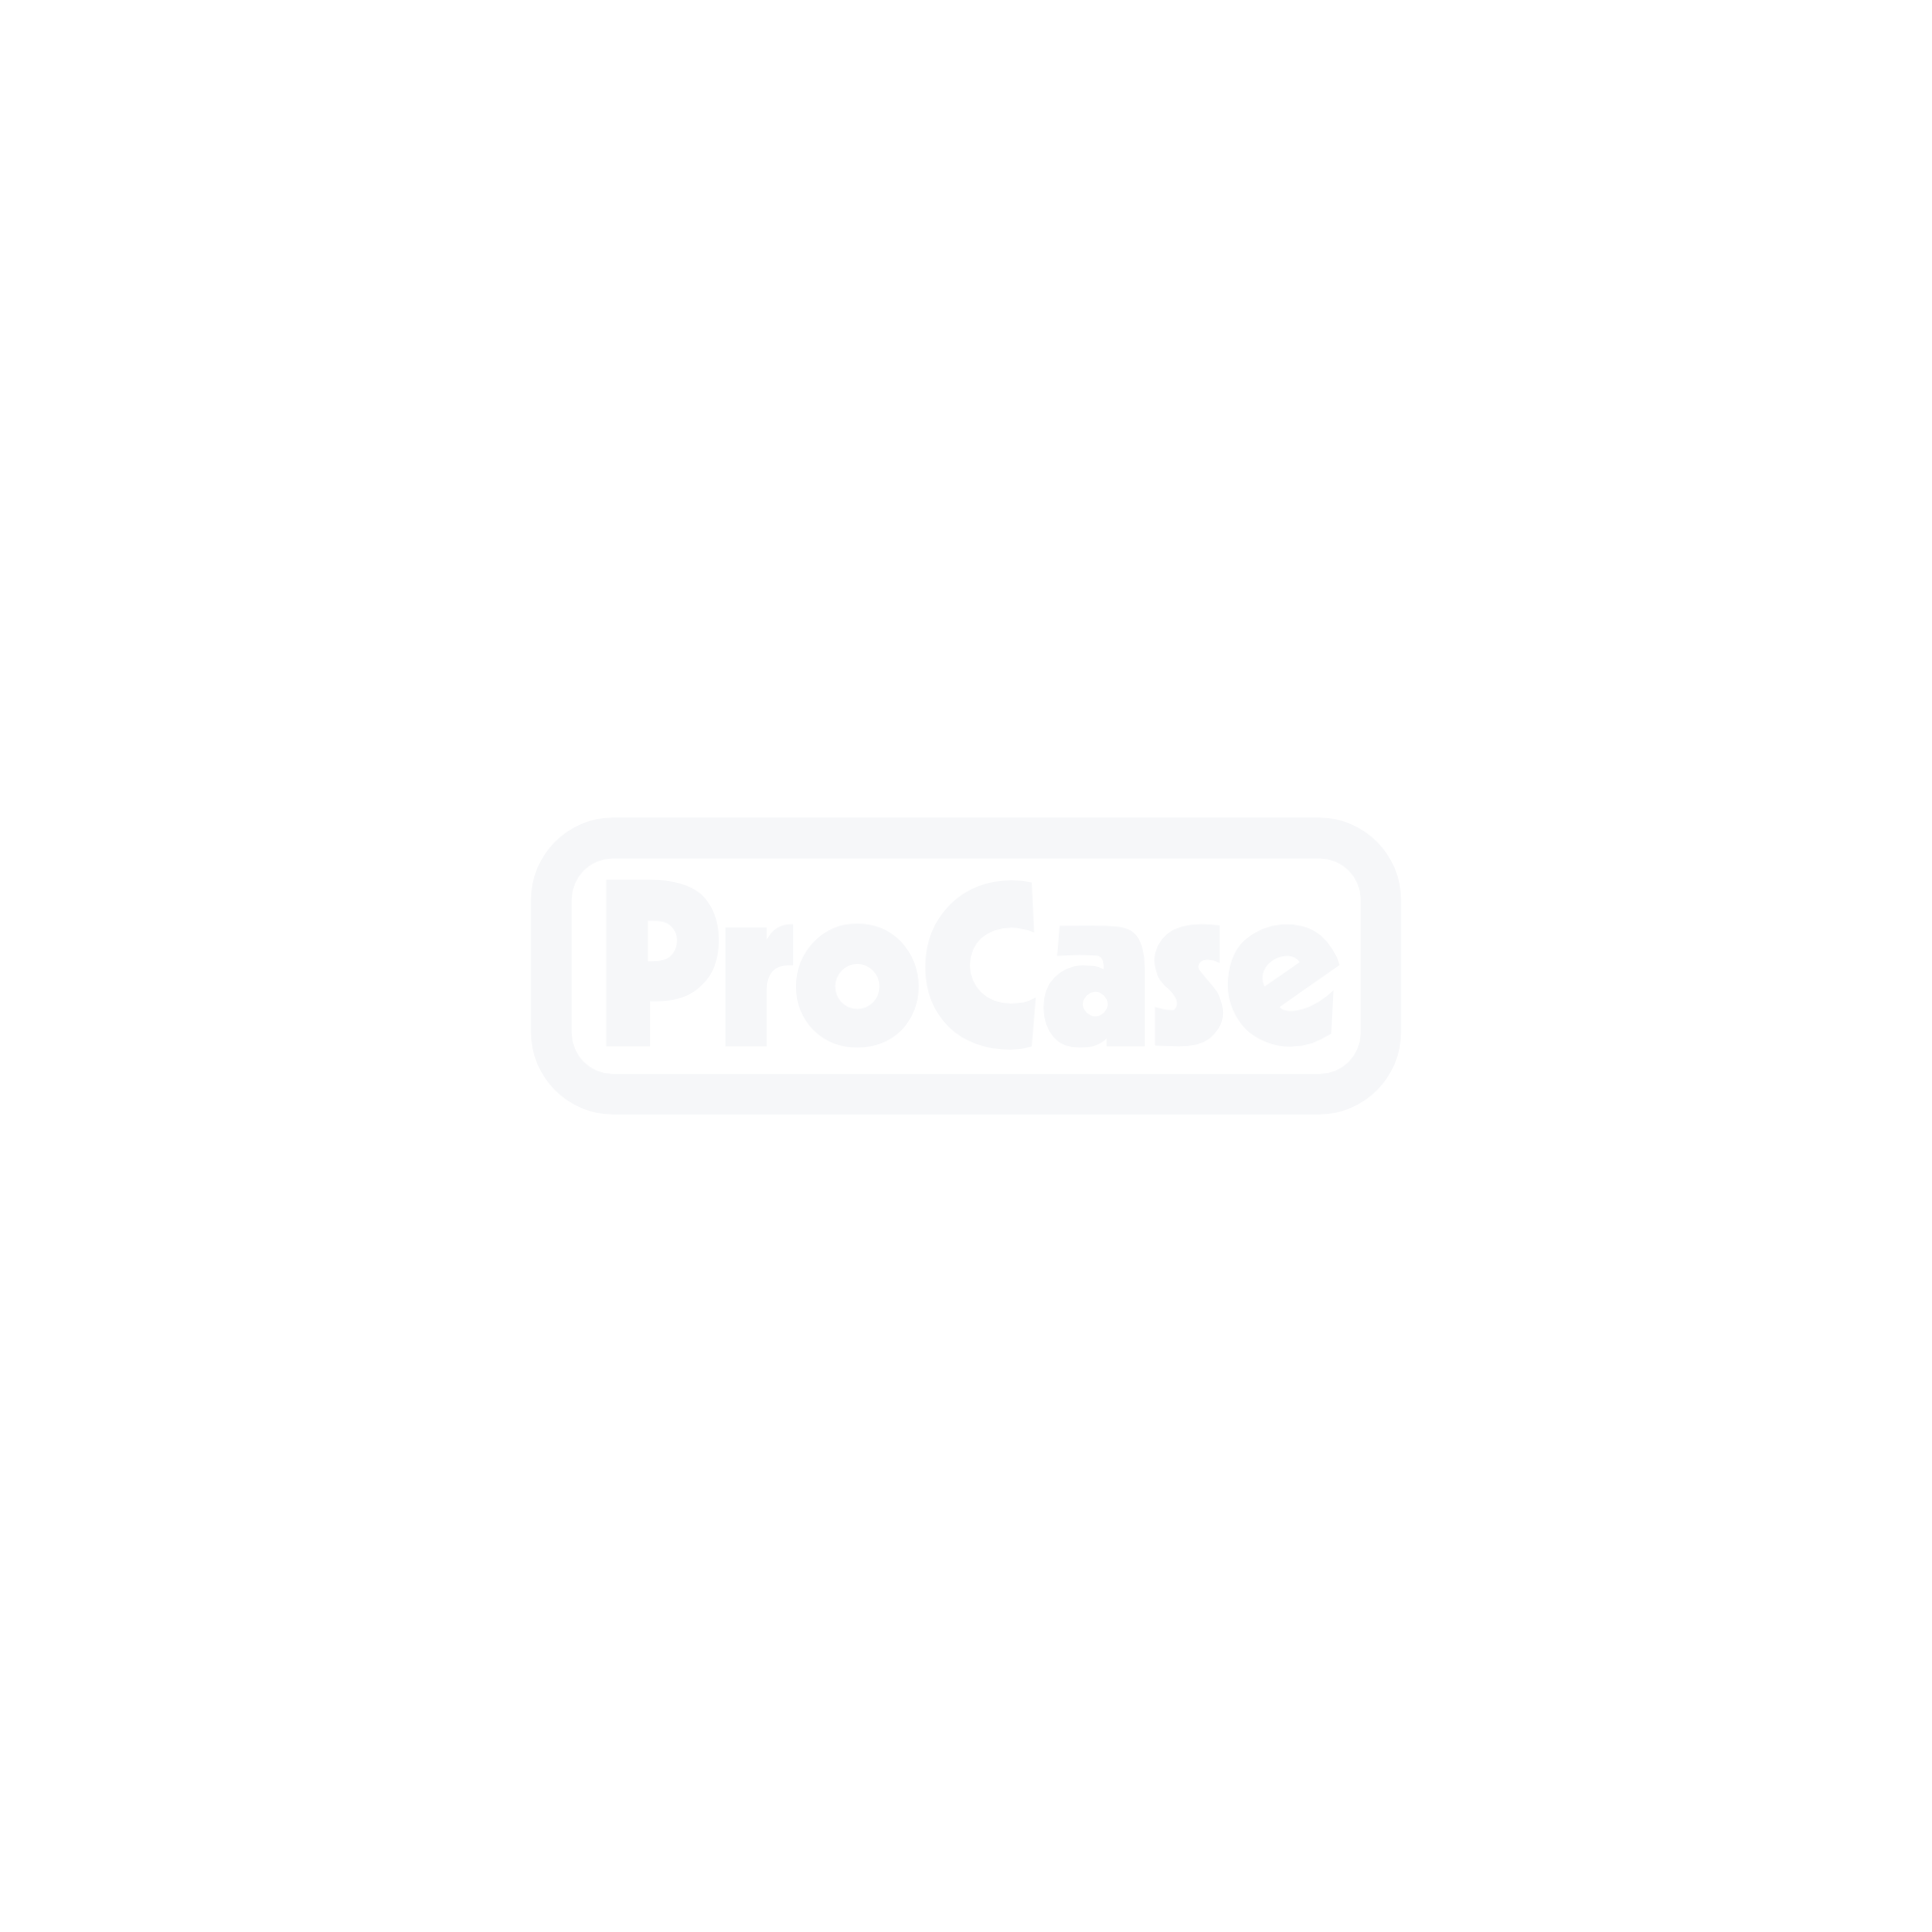 Stapelbox STB3-36 Sperrholzkiste